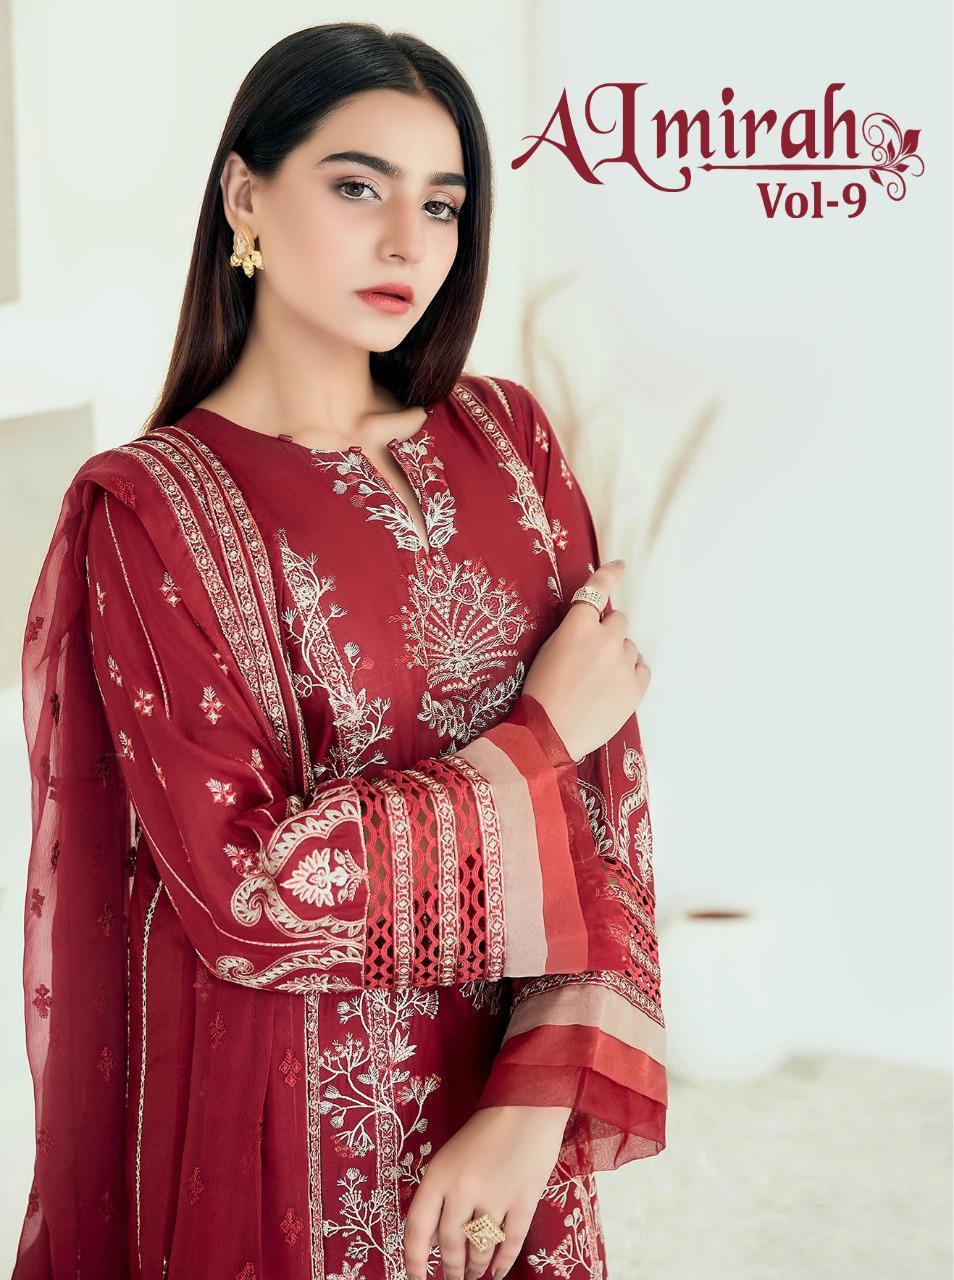 Shree Fabs Almirah Vol 9 Salwar Suit Wholesale Catalog 6 Pcs 1 - Shree Fabs Almirah Vol 9 Salwar Suit Wholesale Catalog 6 Pcs